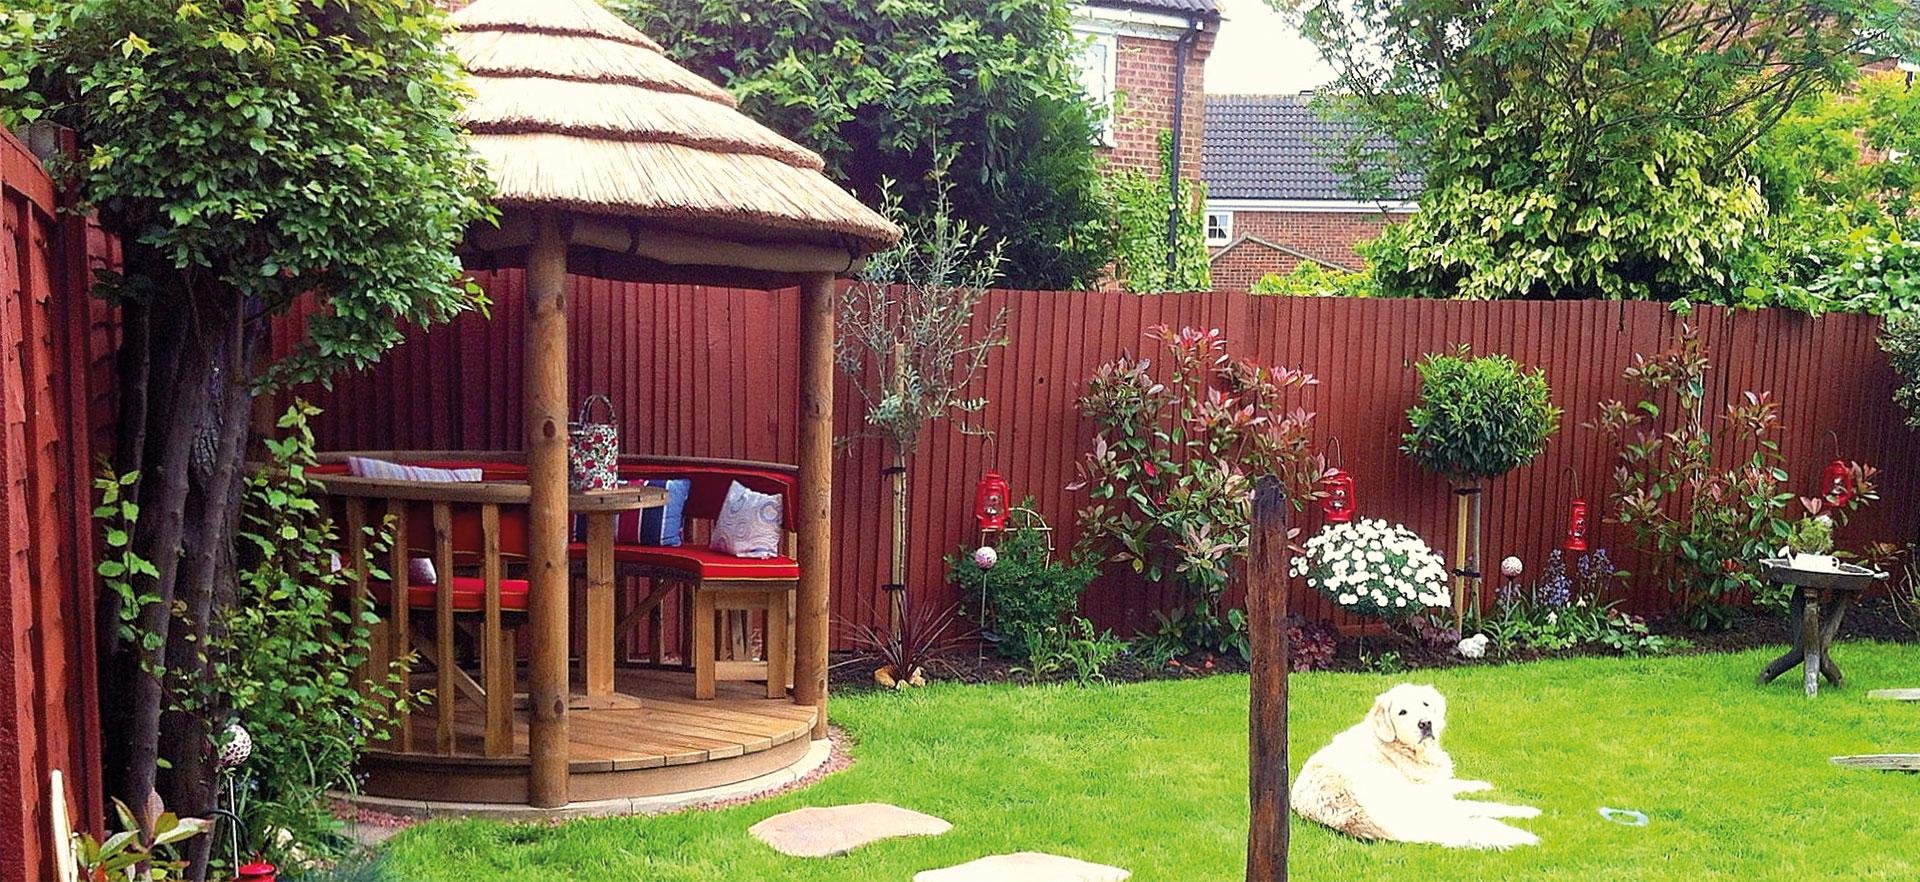 2 metre thatched gazebo in corner of small garden